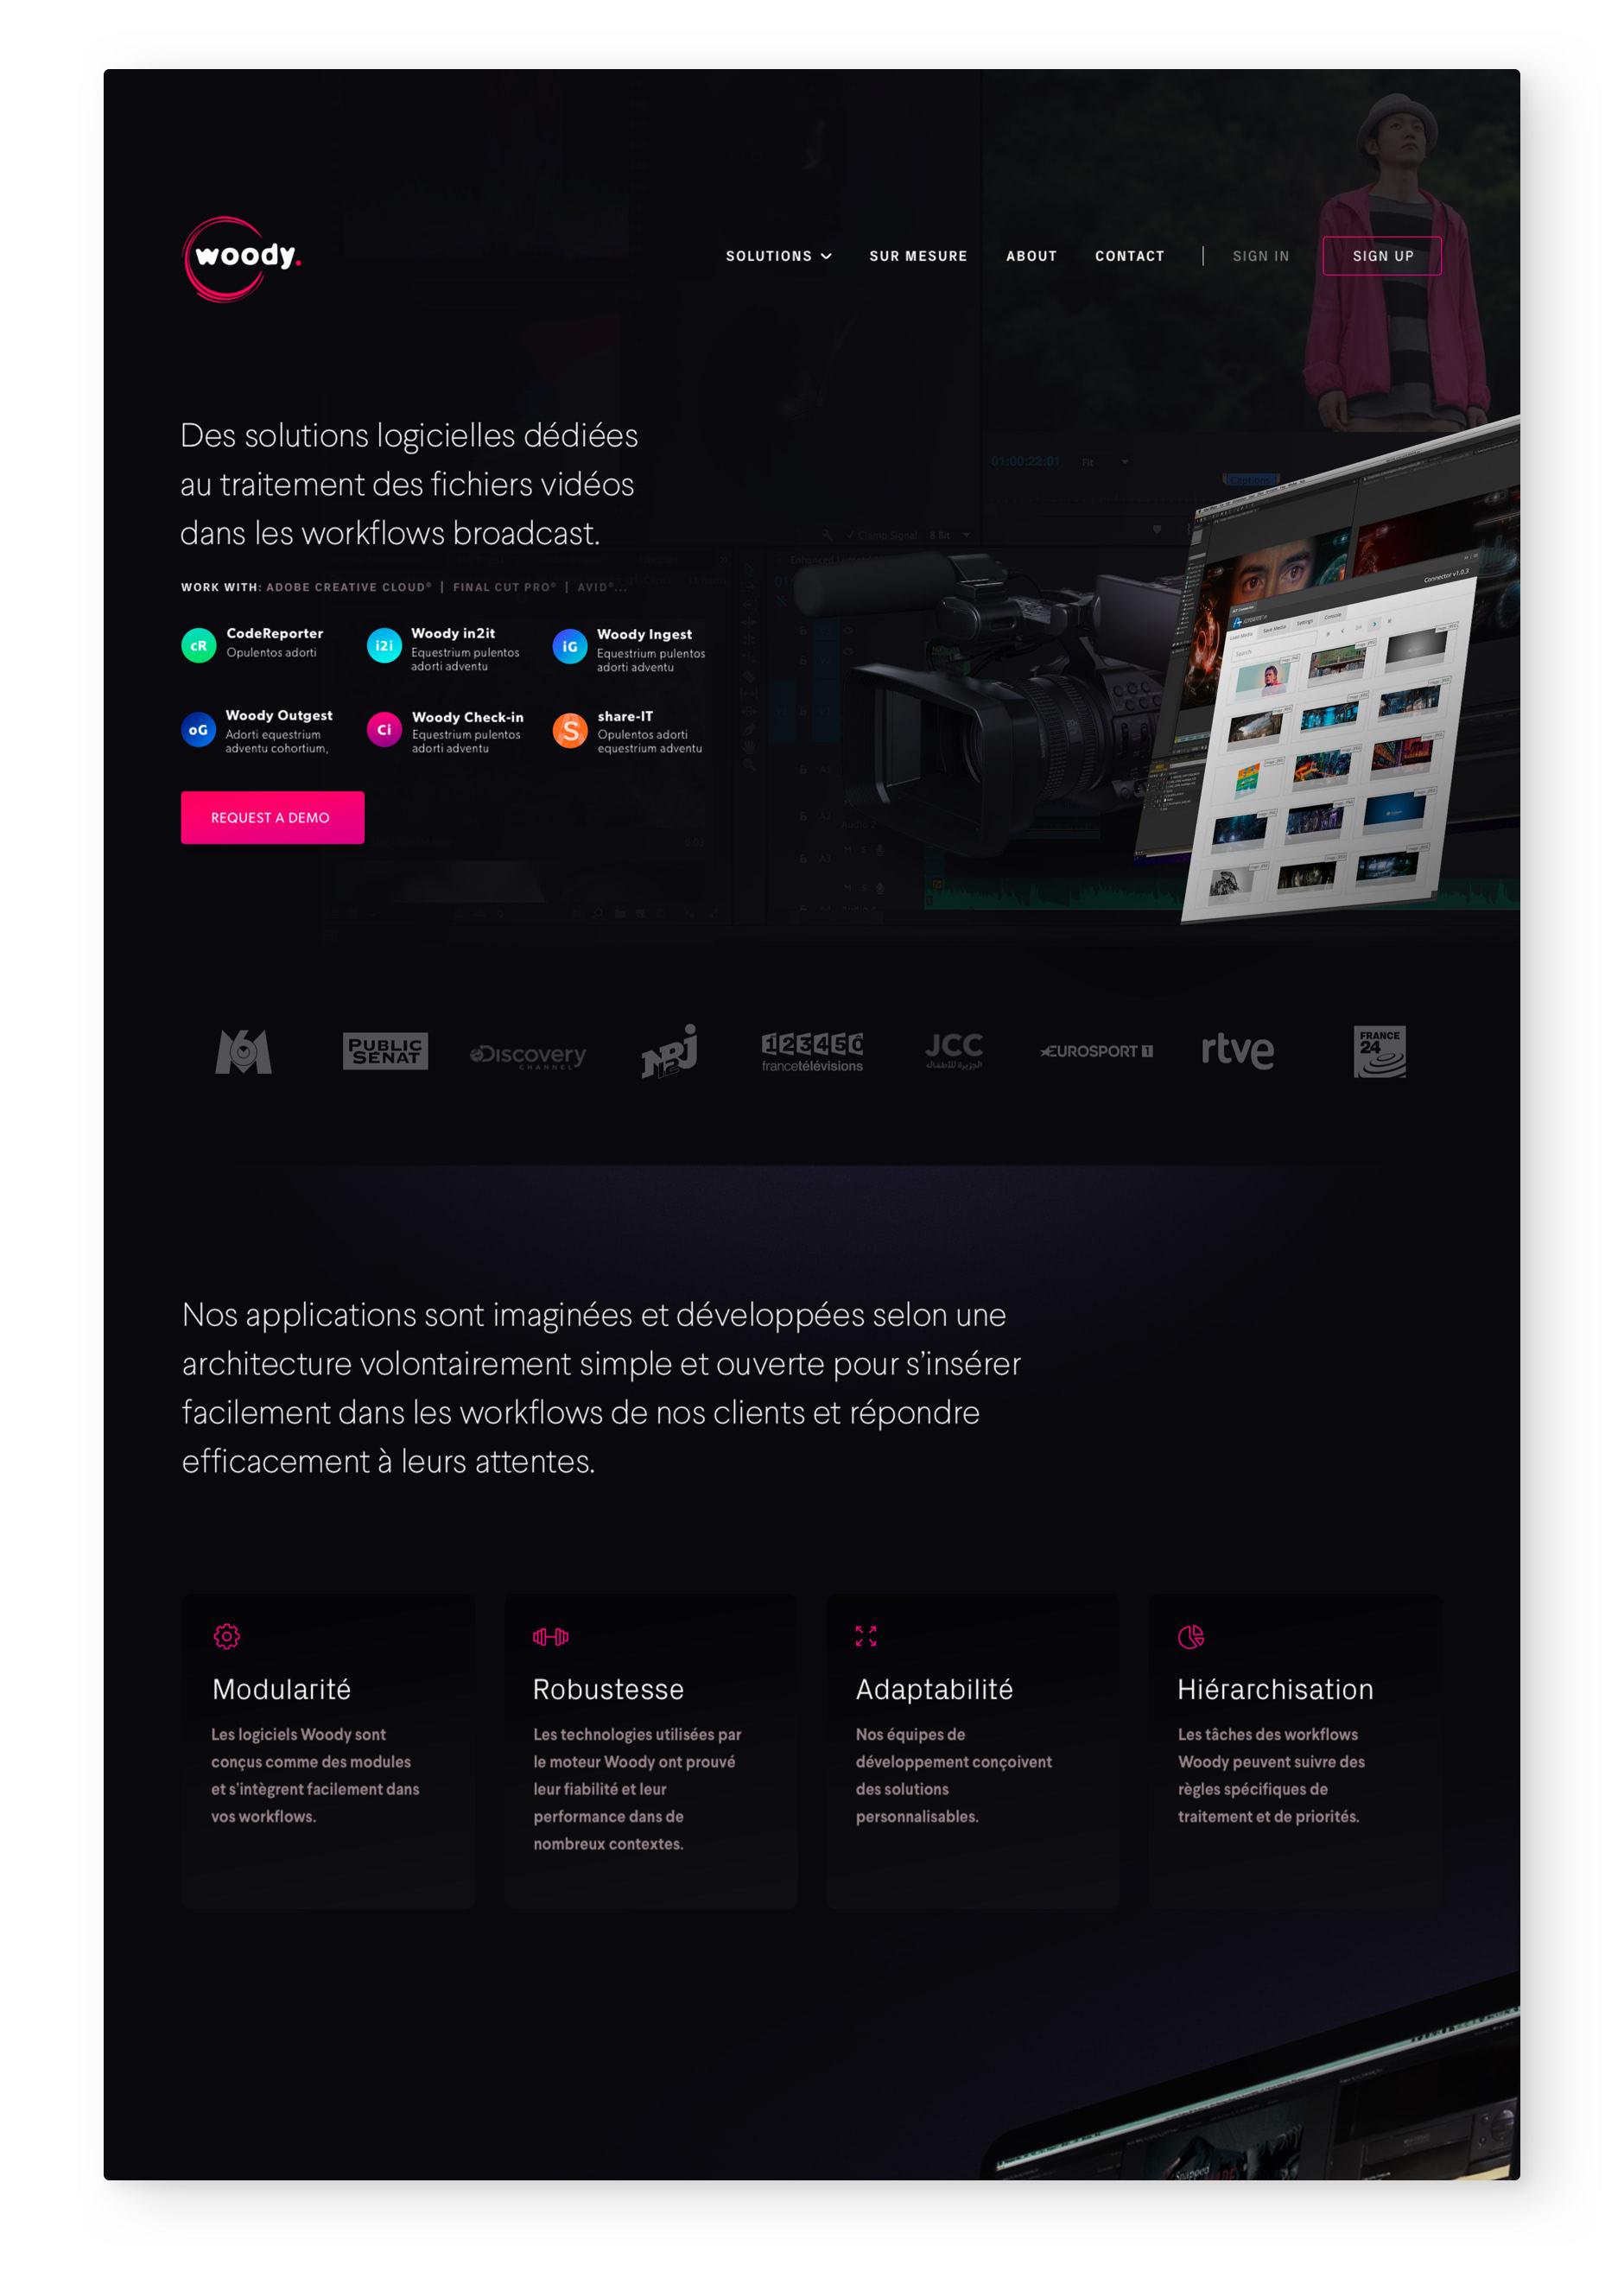 projet-woody-website-robin_p-designer_01@2x